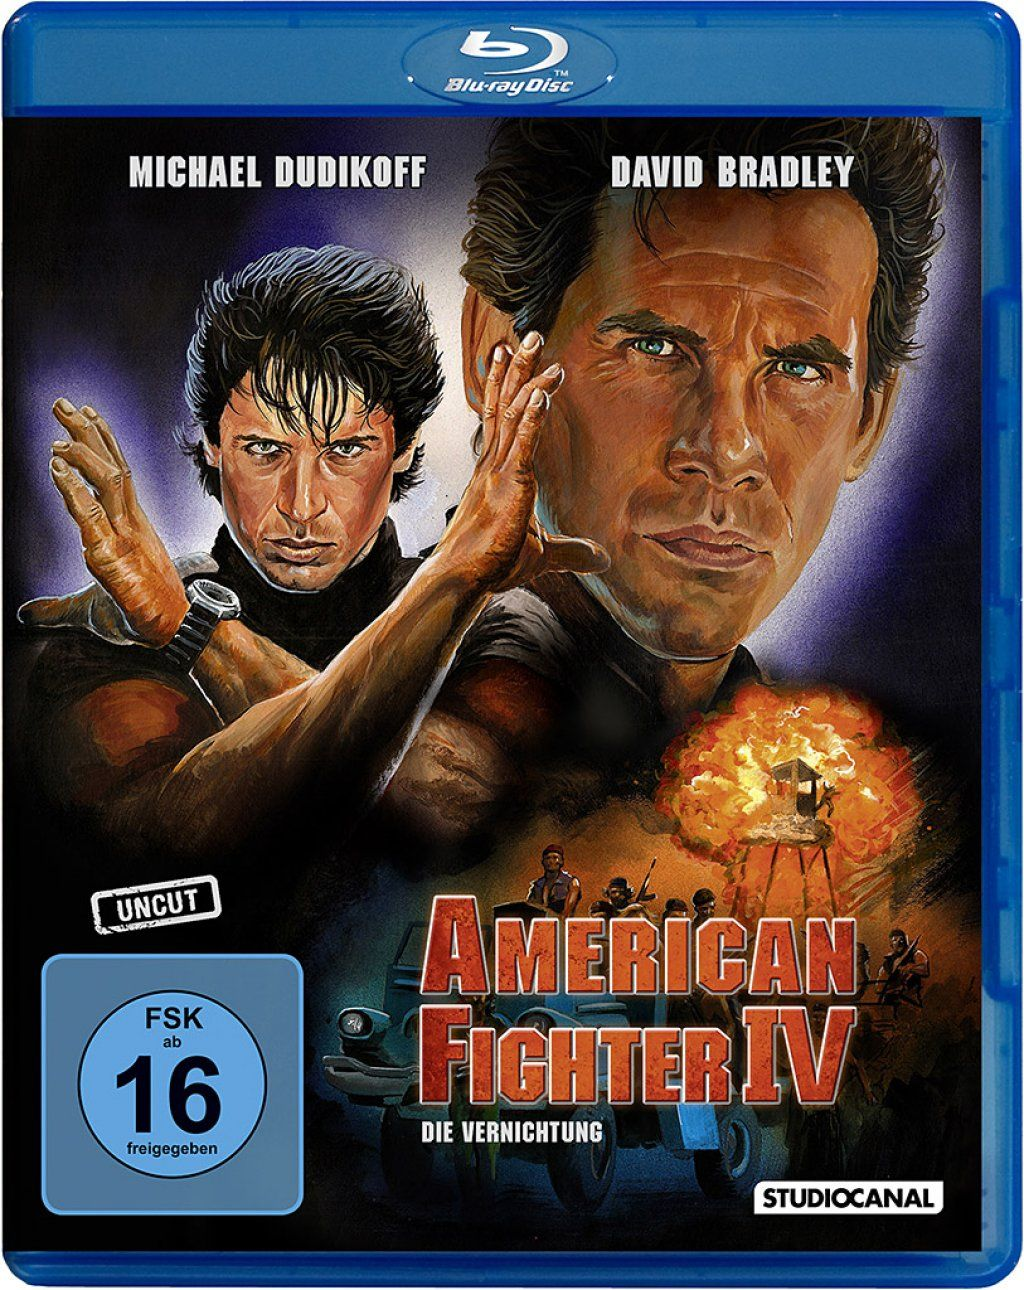 American Fighter 4: Die Vernichtung (Uncut) (BLURAY)